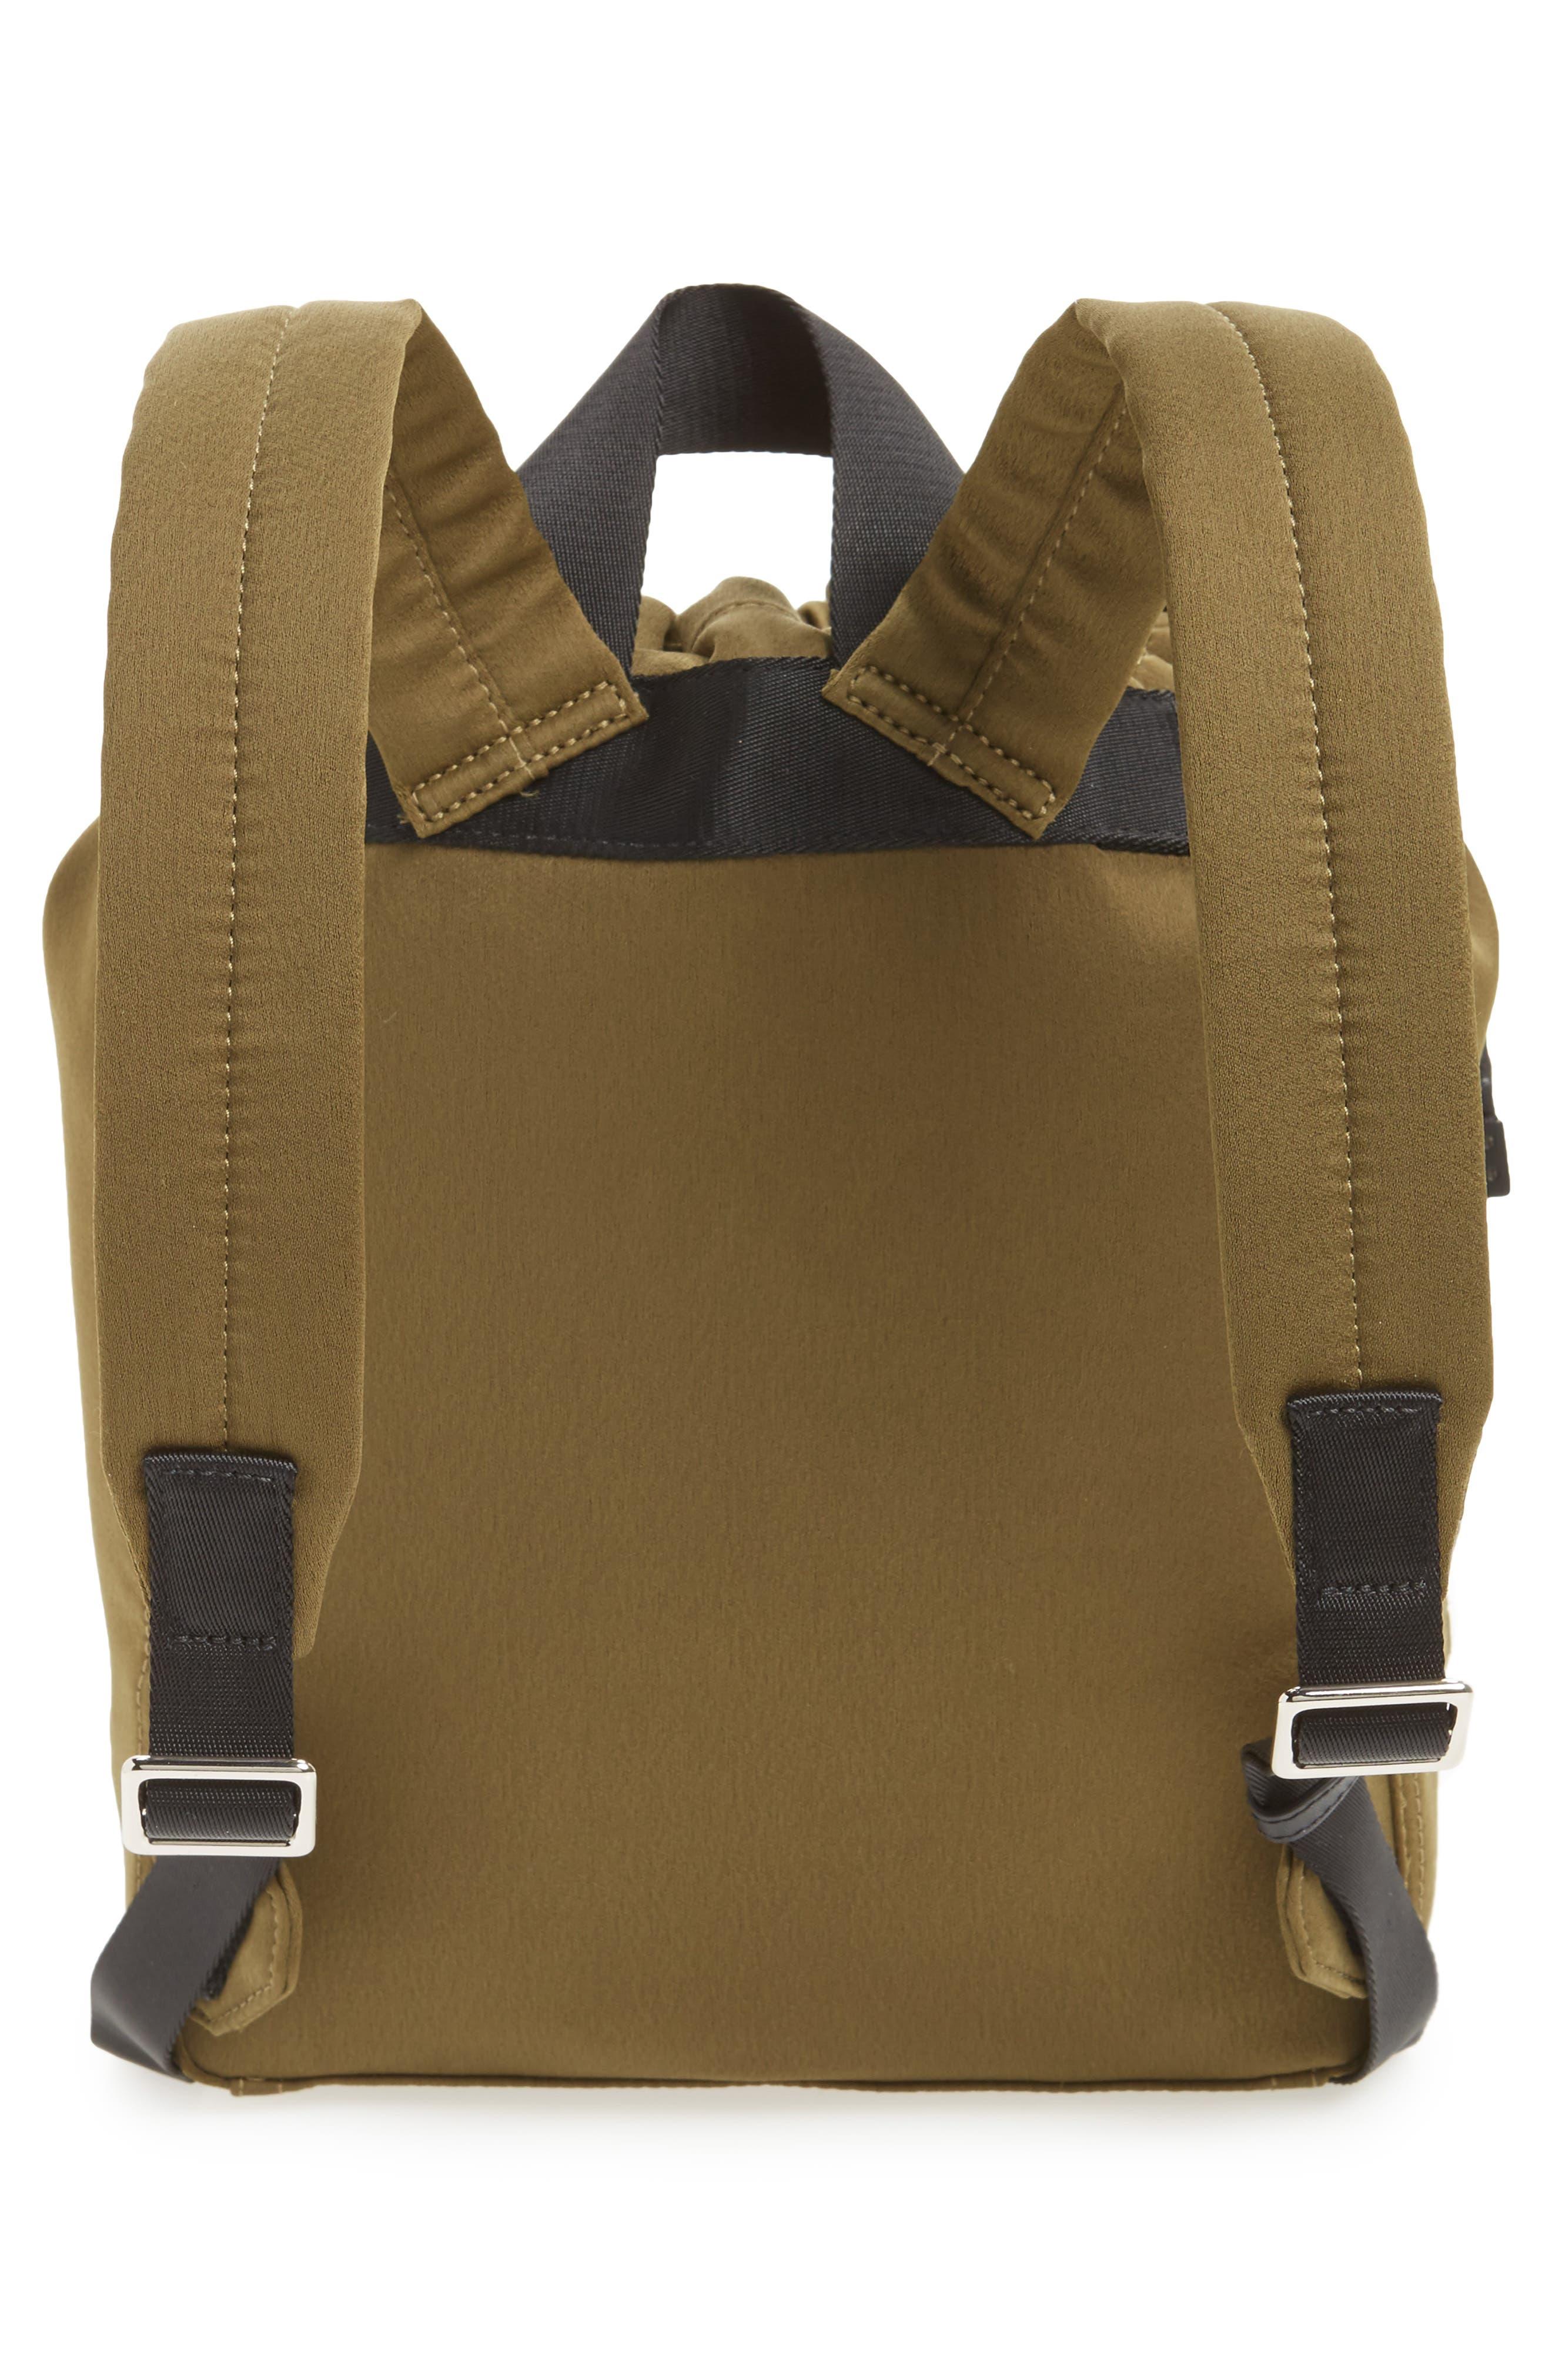 Phillip Lim 3.1 Medium Go-Go Embellished Backpack,                             Alternate thumbnail 5, color,